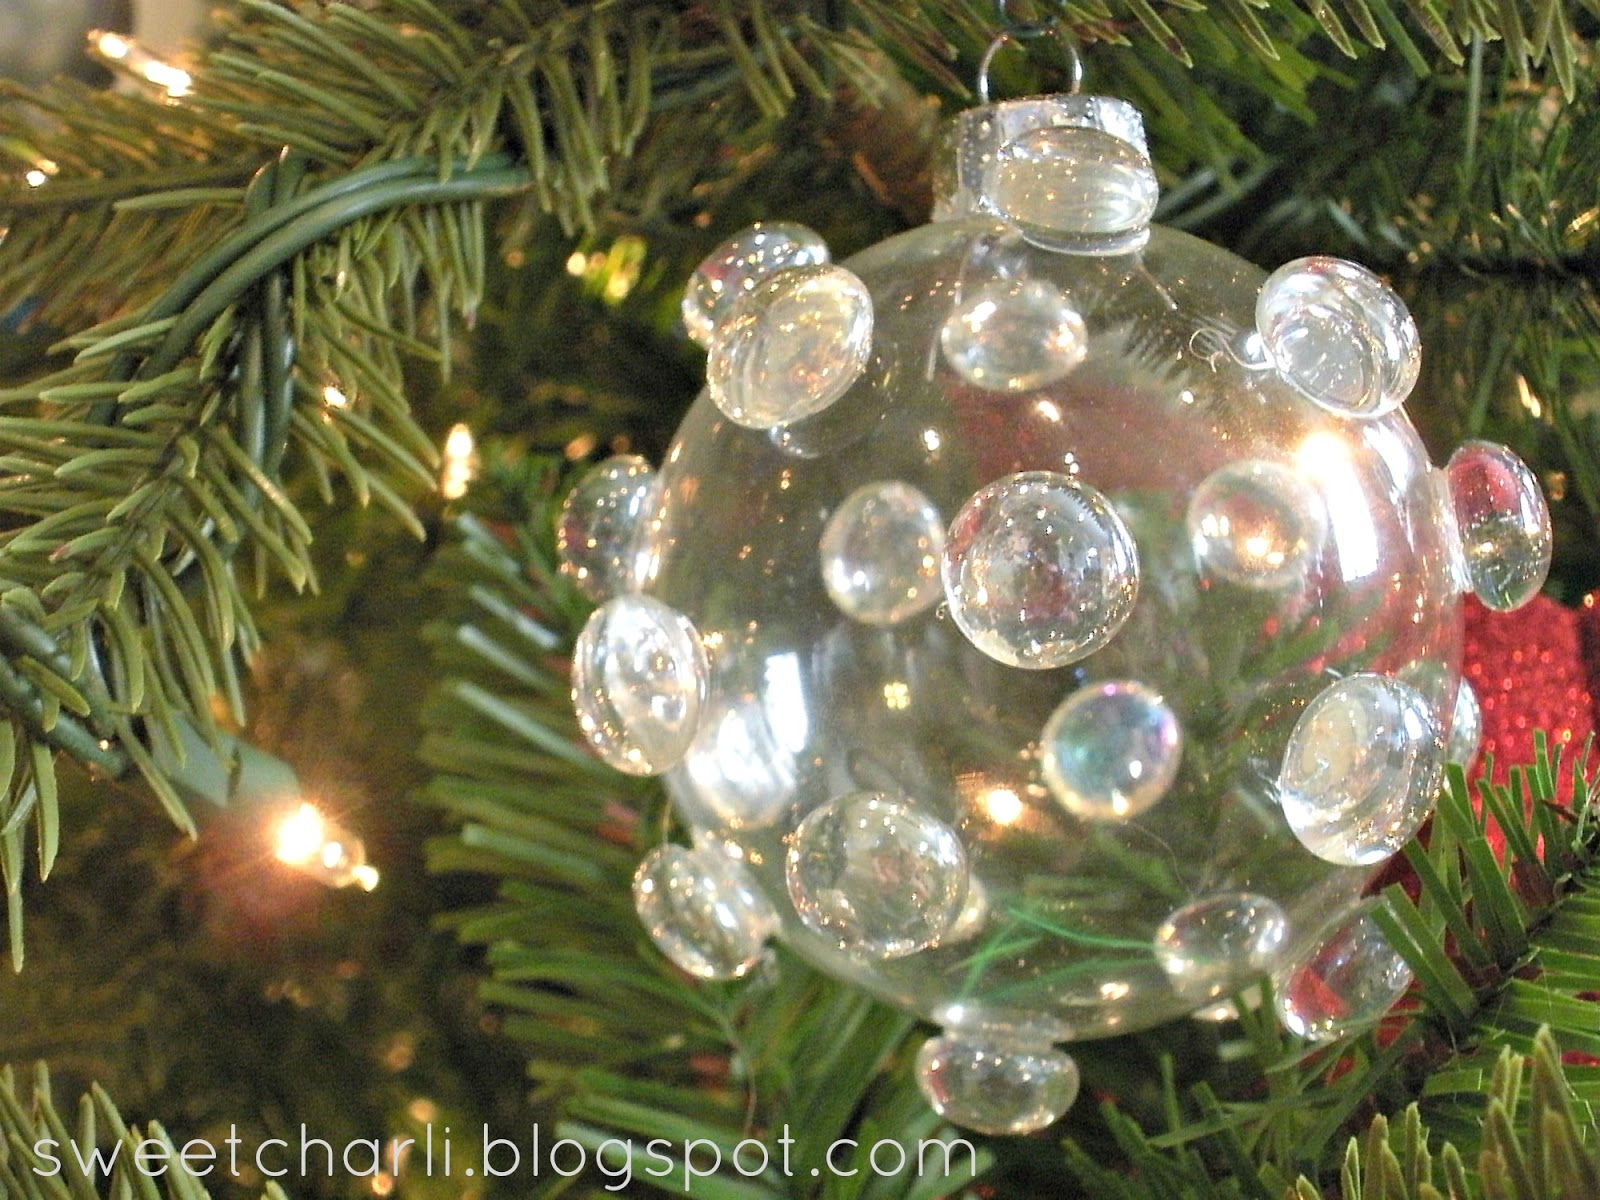 Diy glass ball ornament rocks sweet charli